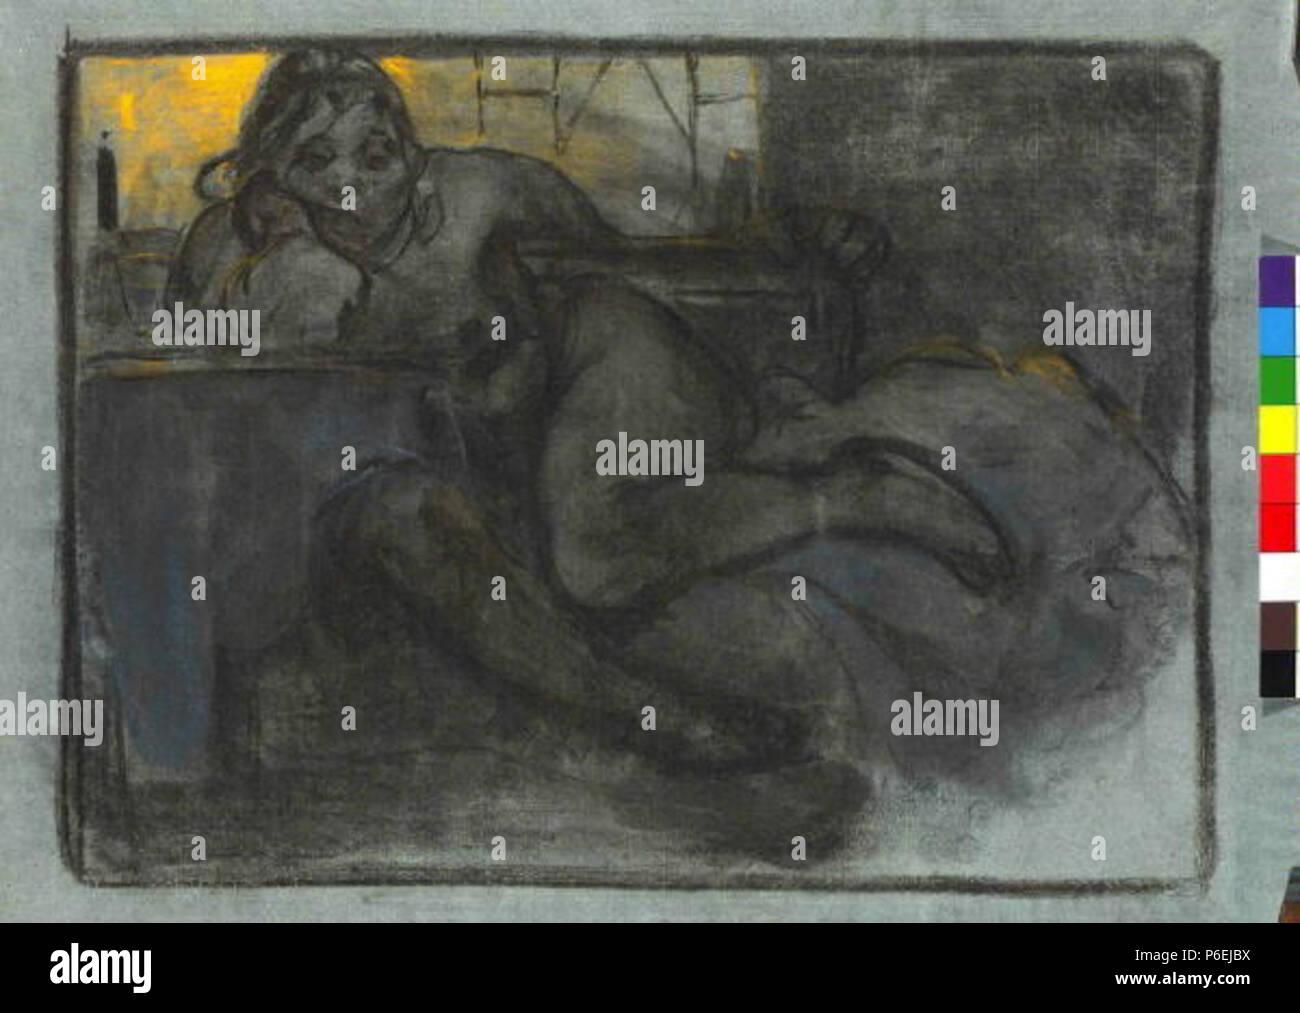 . Eština: La llamada absint (Studie ženy) después de 1900 6 Autor Alfons Mucha 24.7.1860-14.7.1939 - La llamada absint Studie zeny Foto de stock